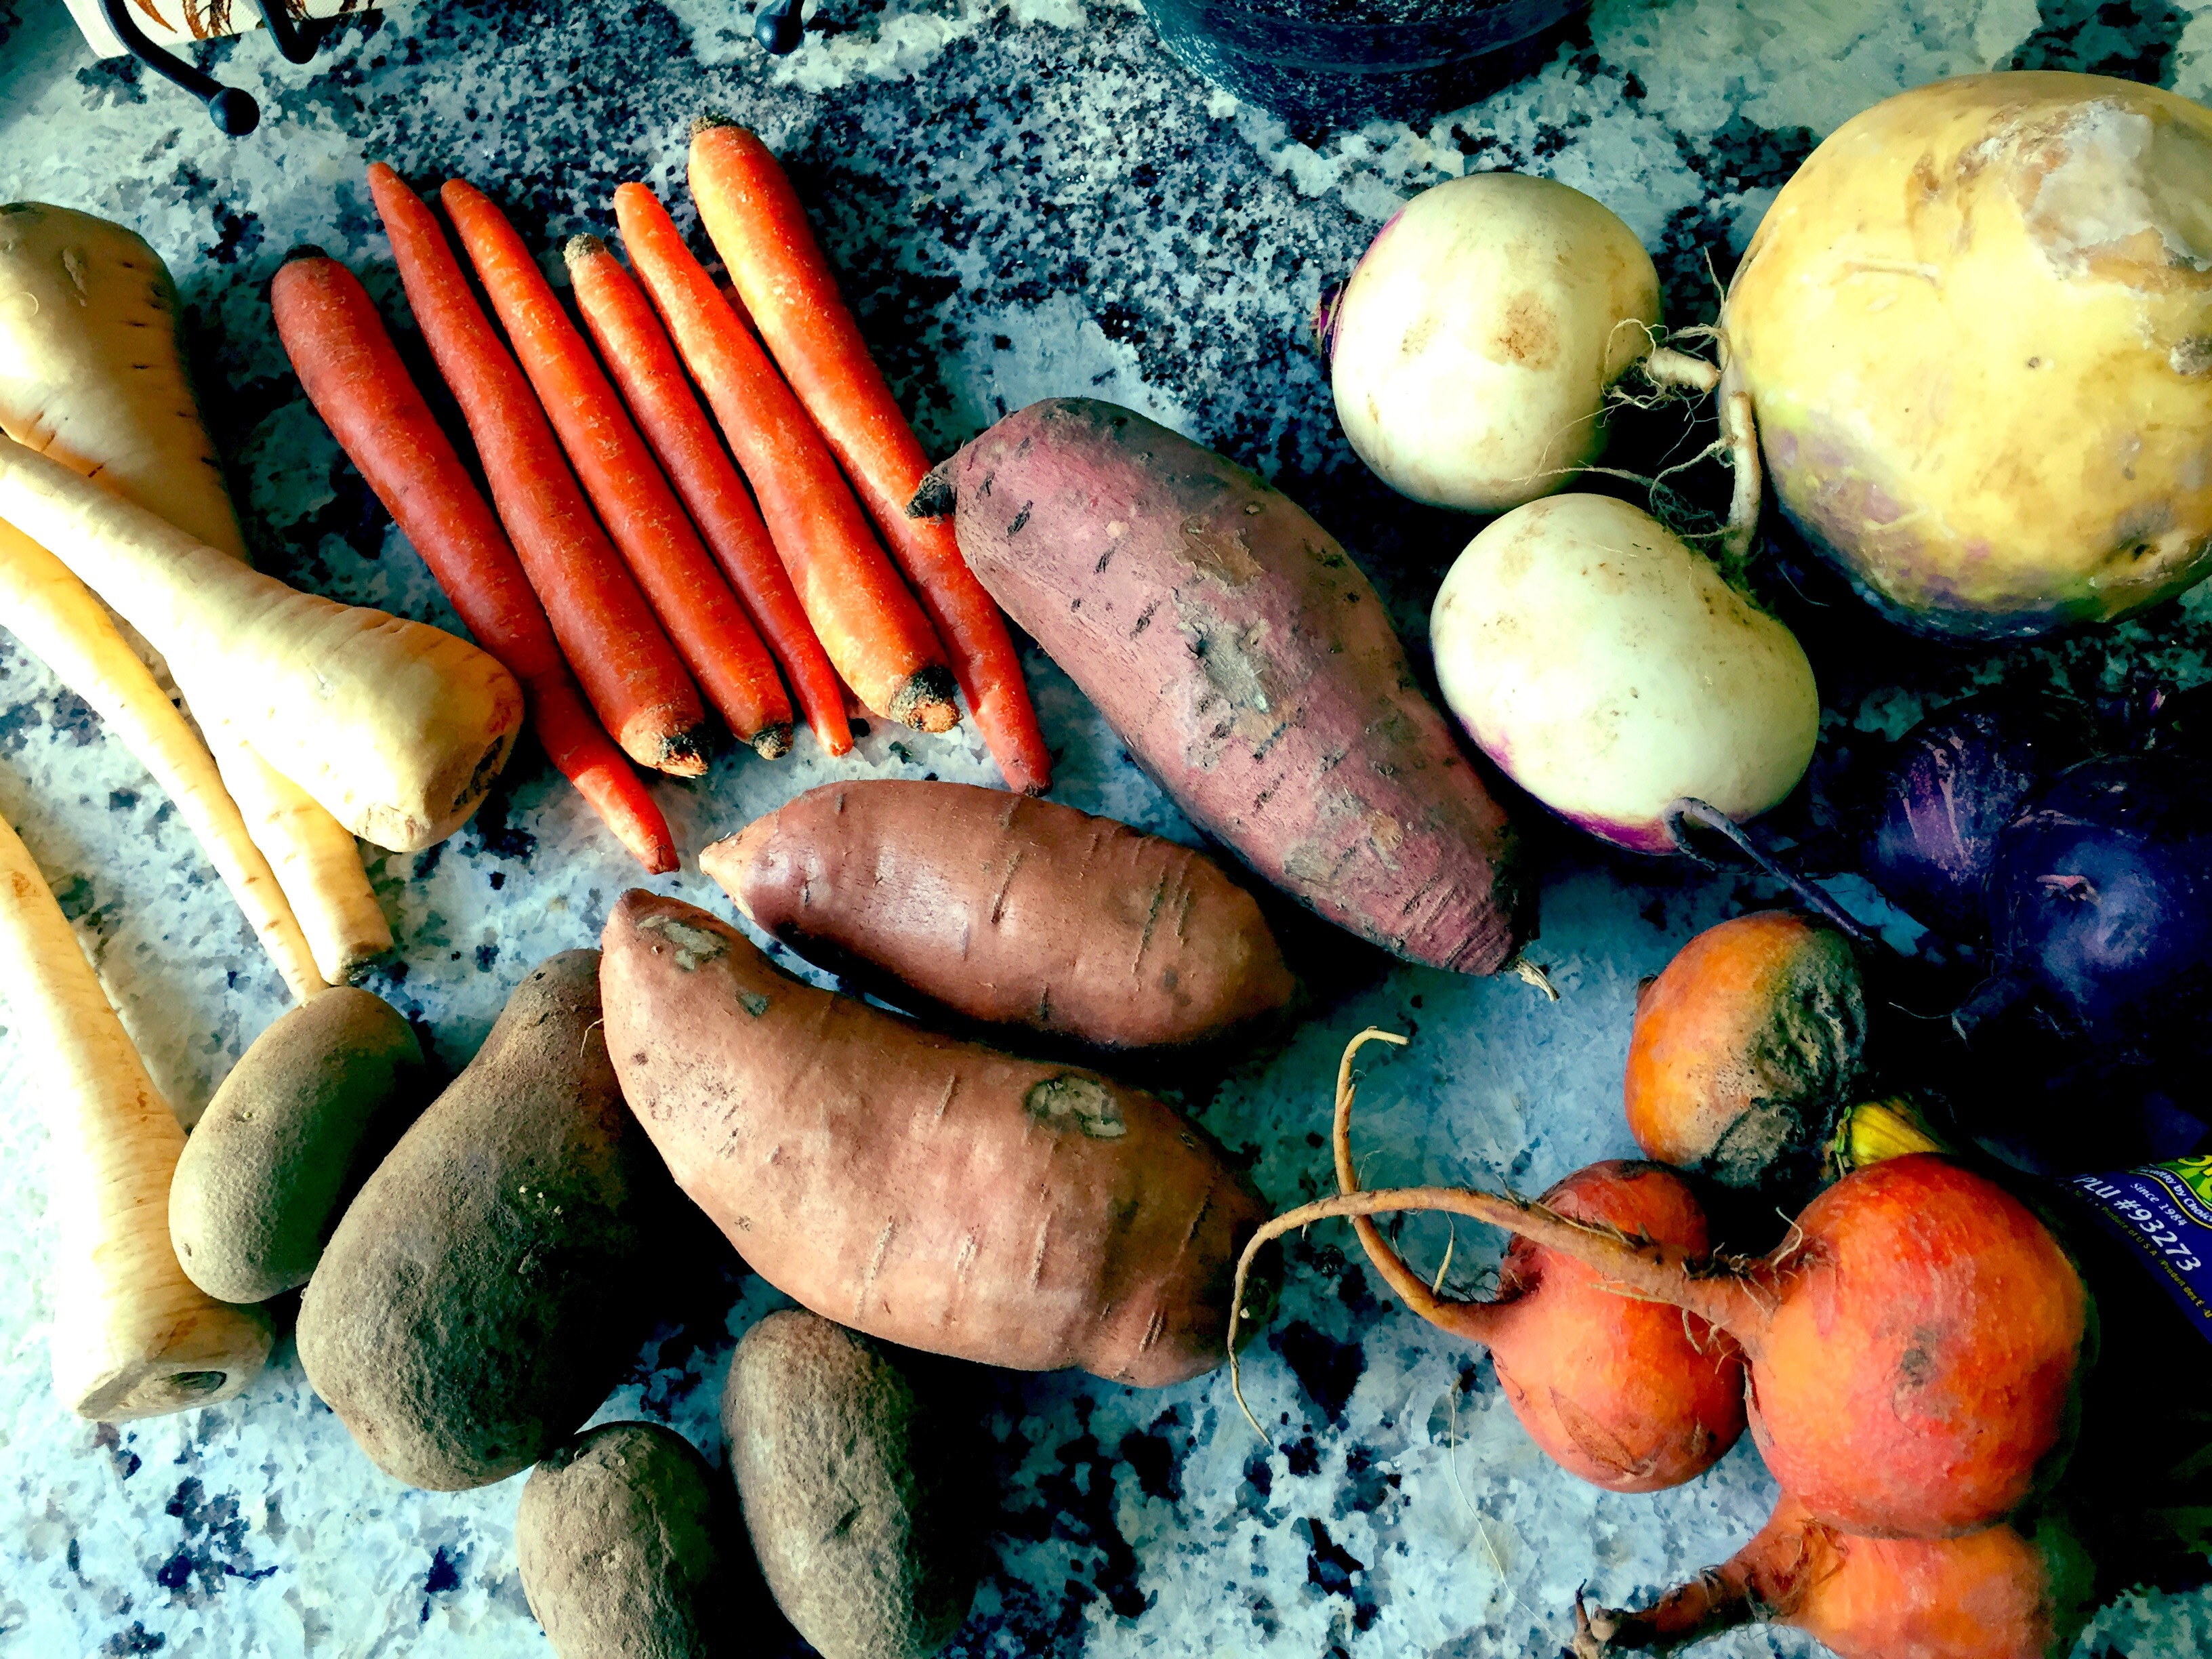 Vegetables for Roasting